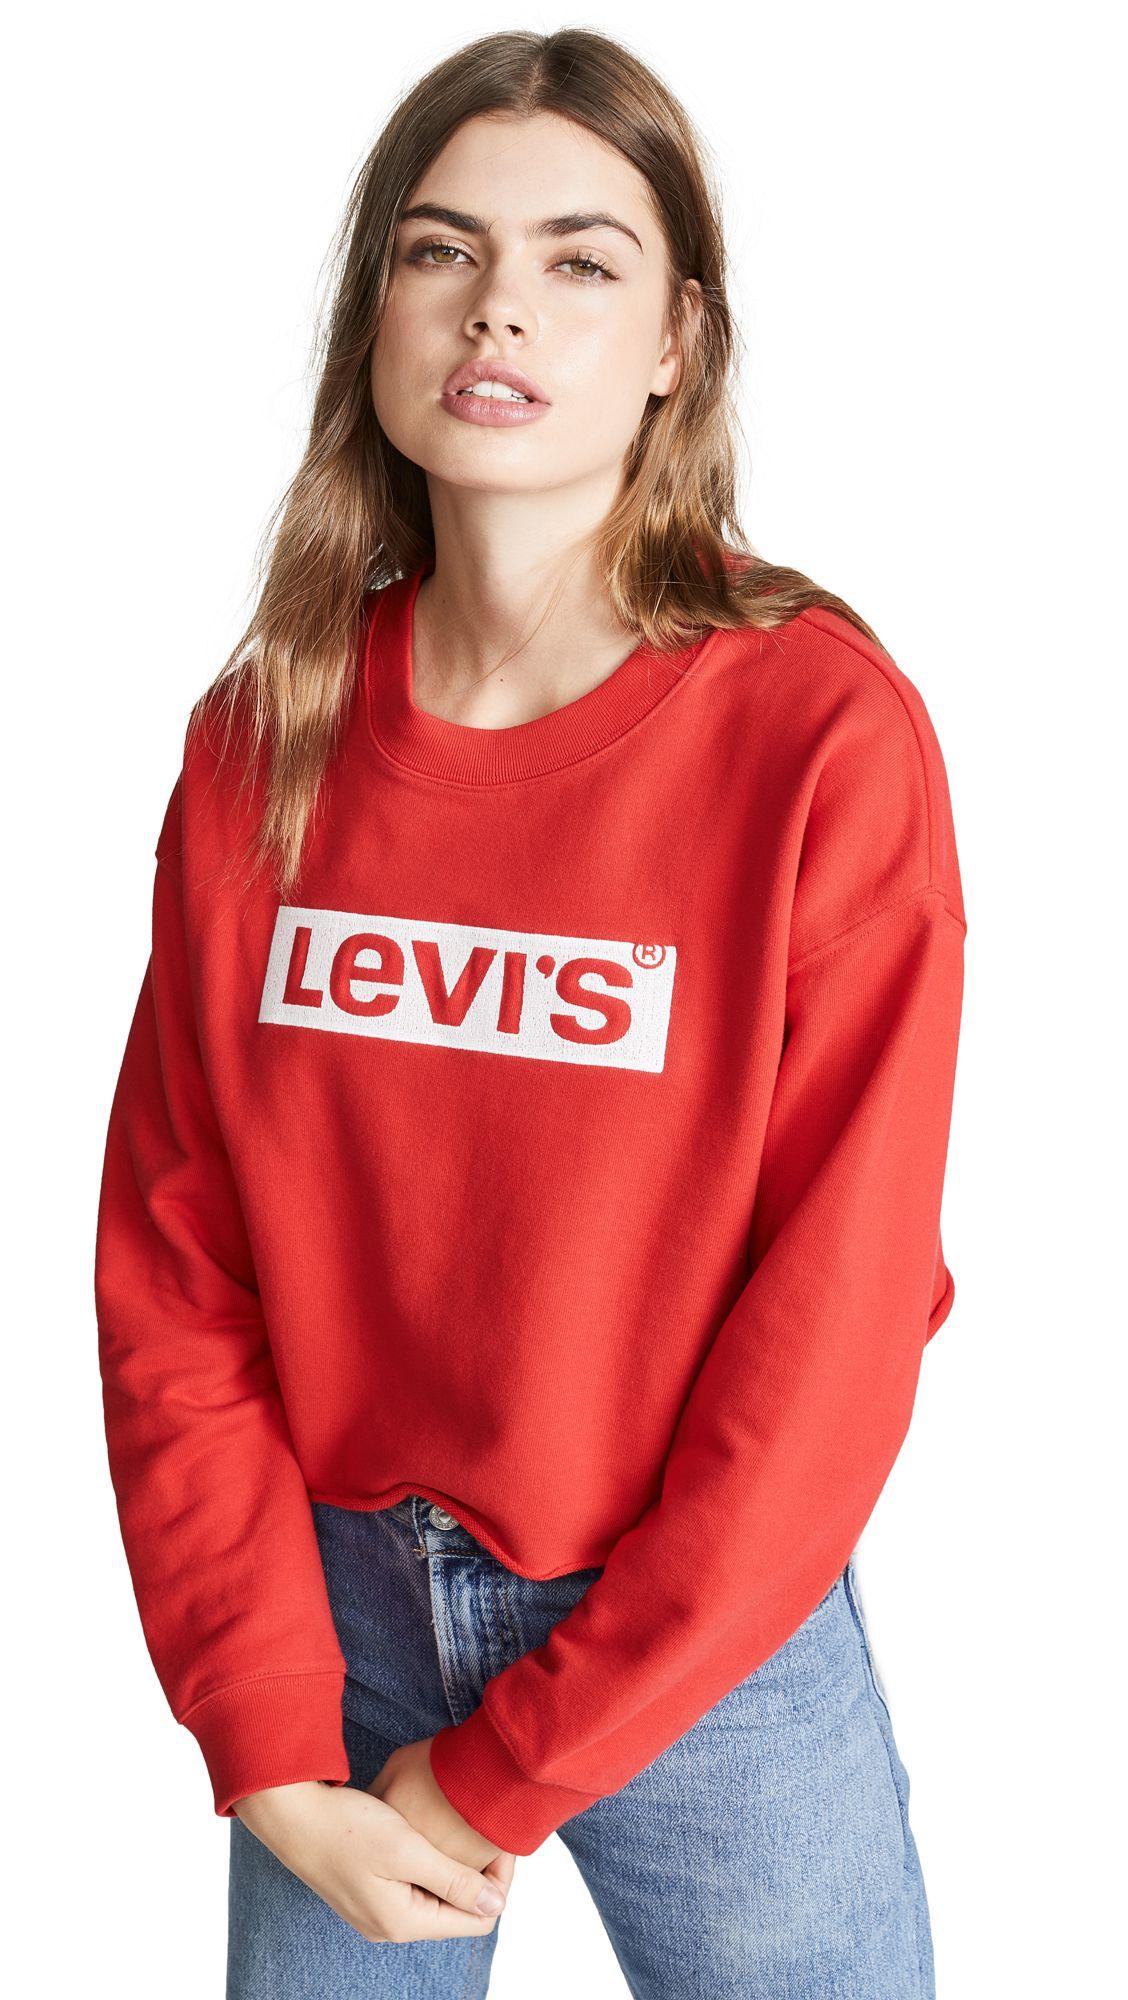 bd3563e6 LEVI'S GRAPHIC RAW CUT CREW NECK SWEATSHIRT. #levis #cloth   Levi'S ...